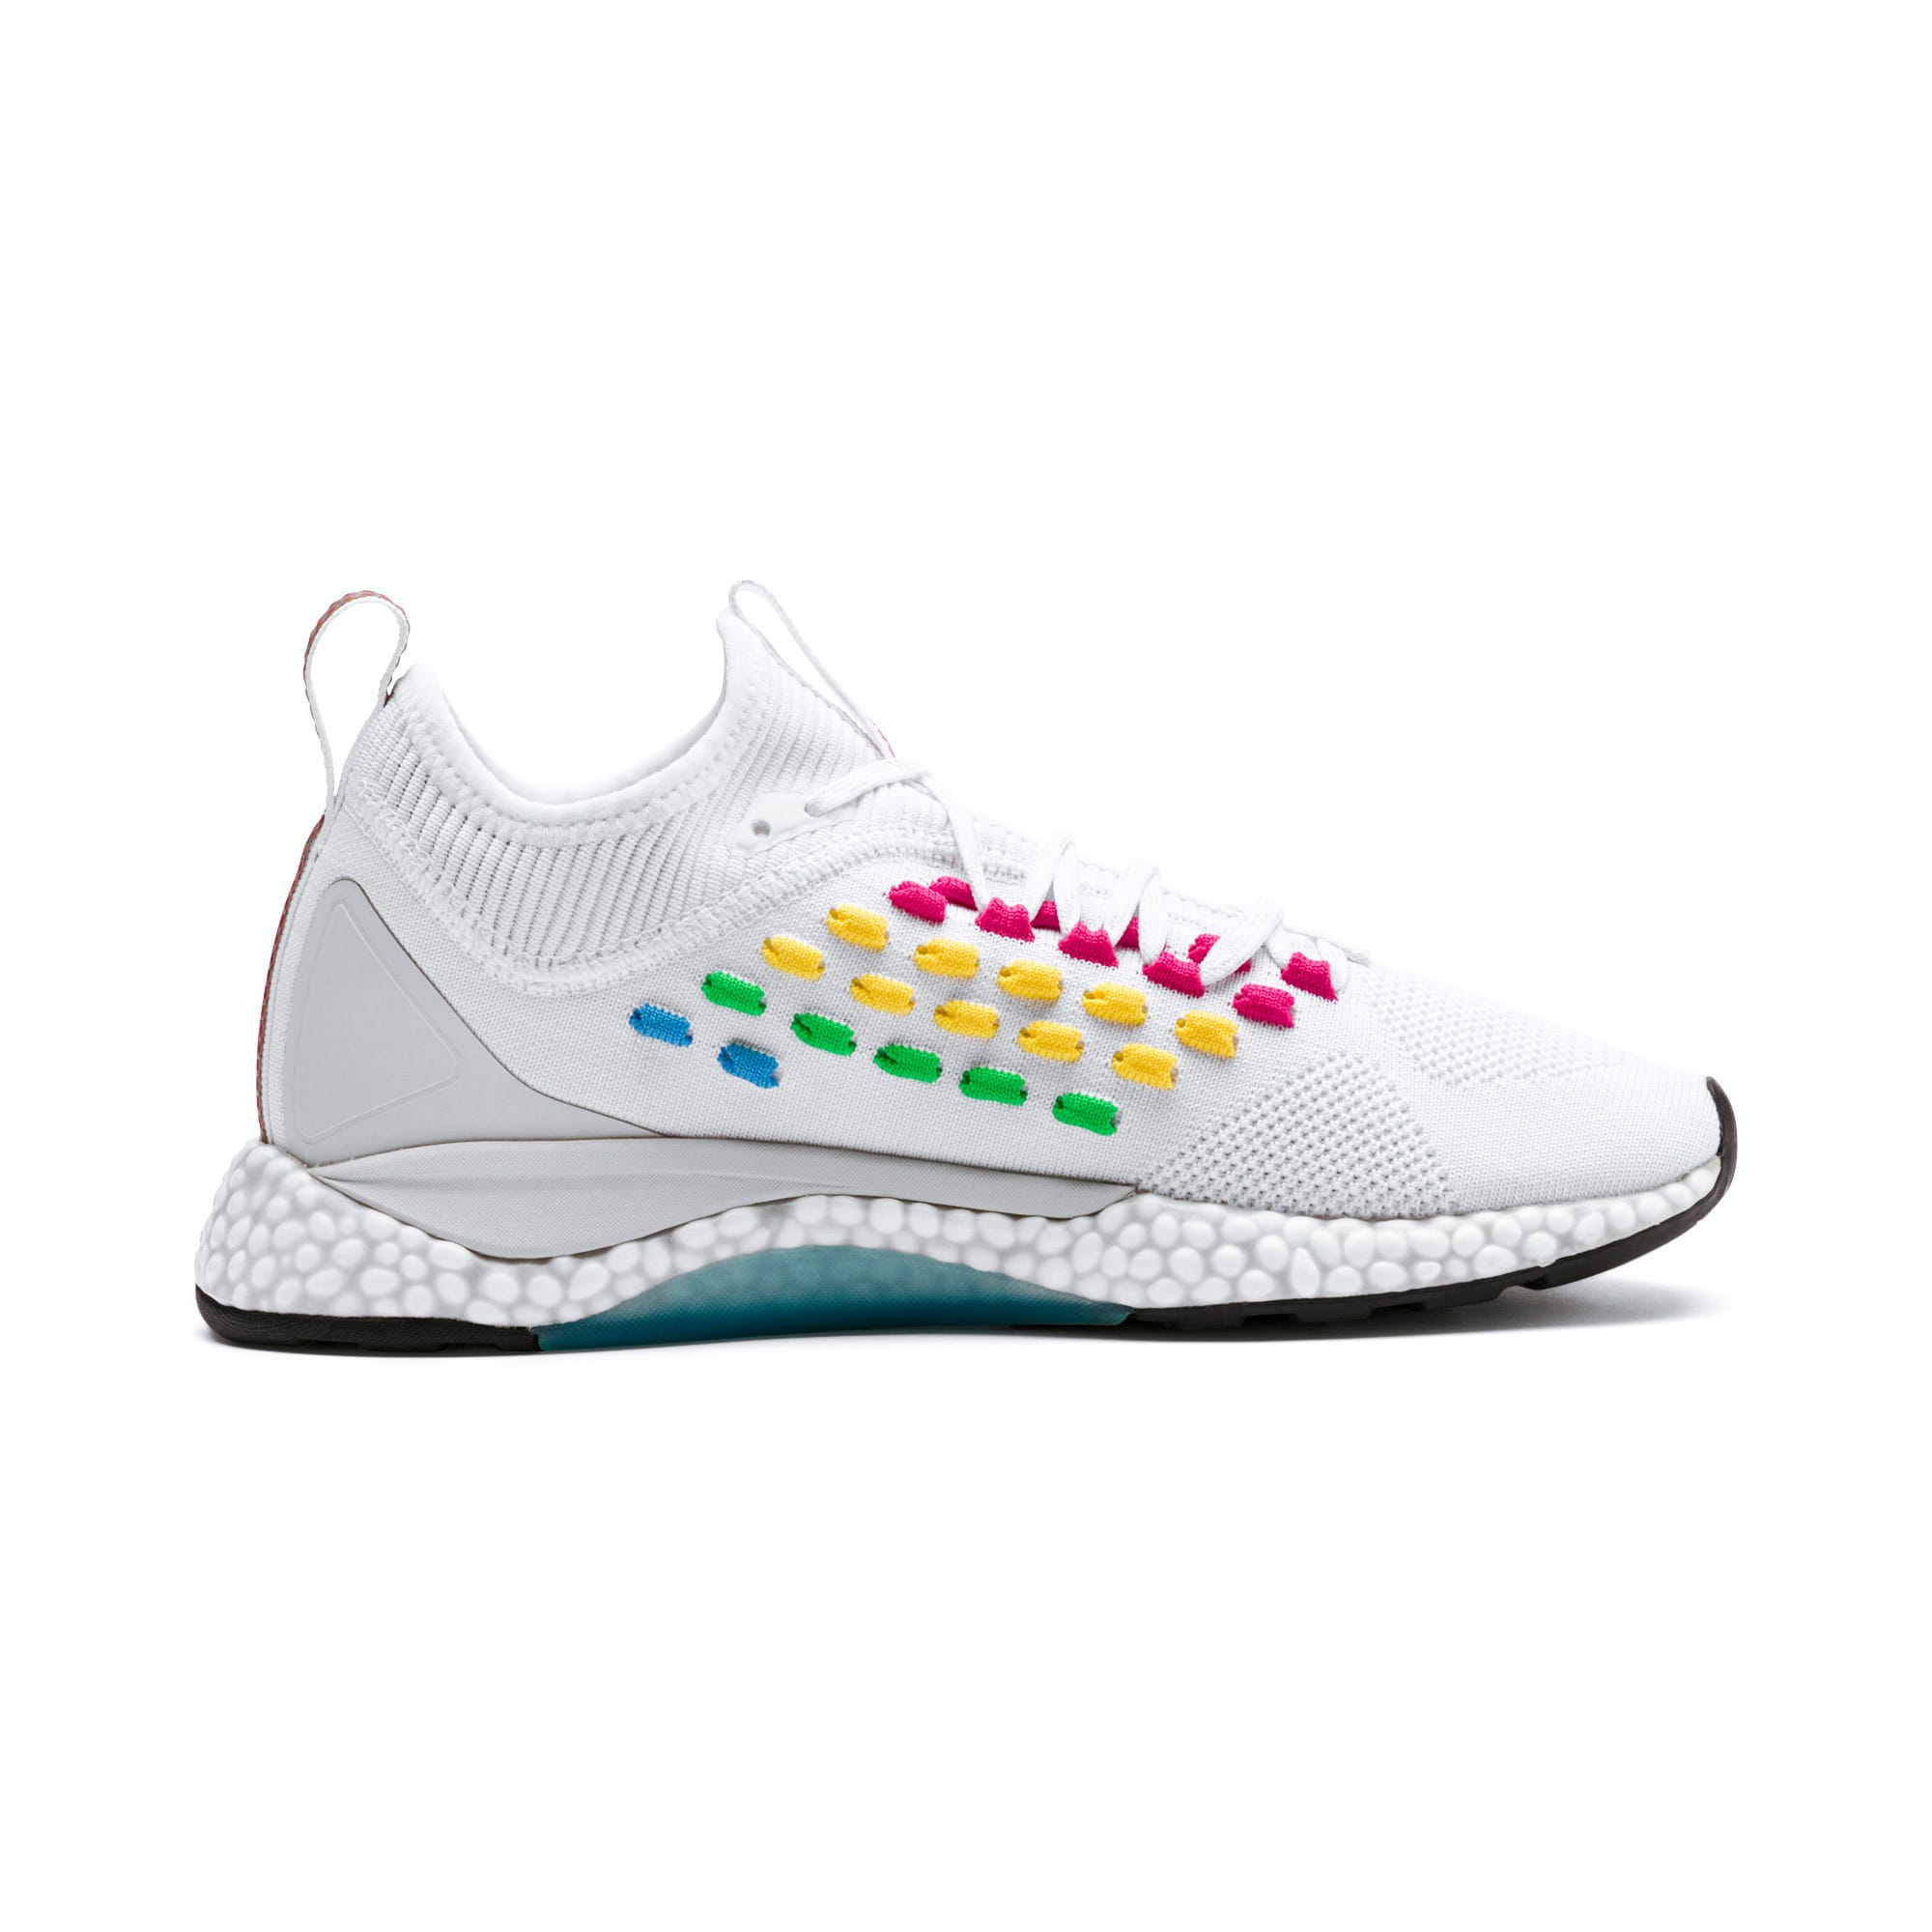 Thumbnail 5 of FUSEFIT HEATMAP Women's Running Shoes, Puma White-Glacier Gray, medium